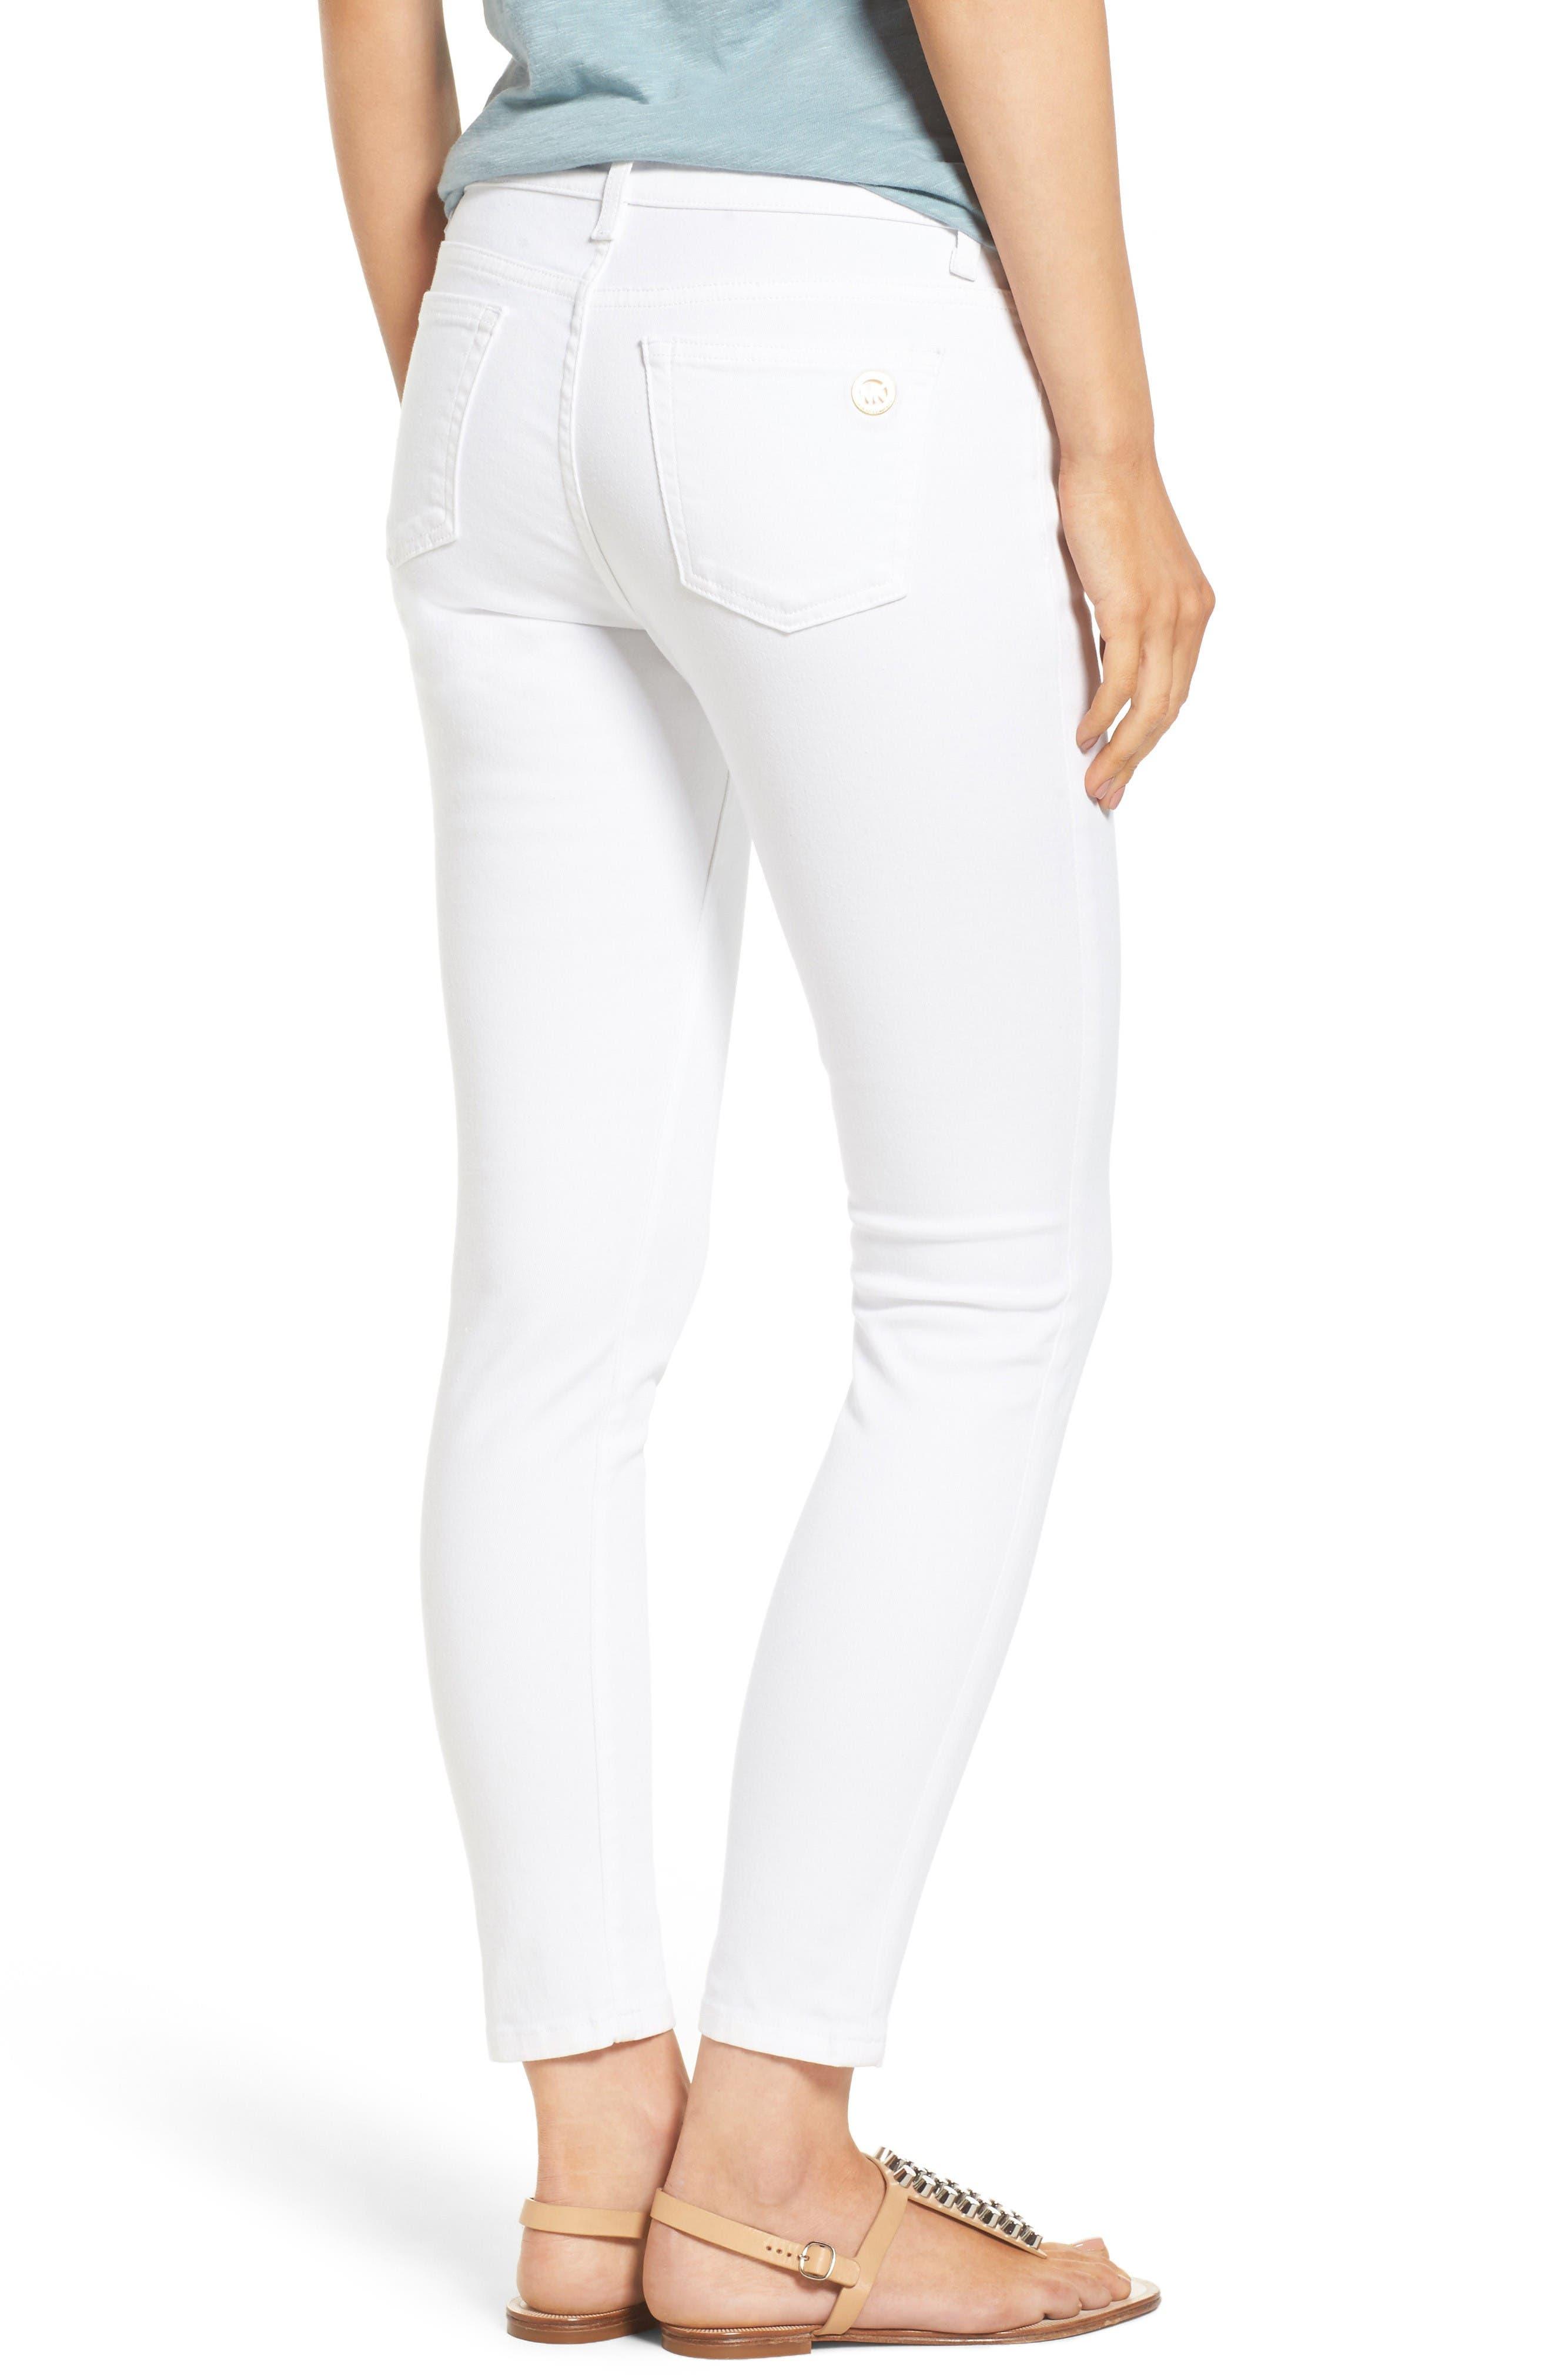 Izzy Ankle Skinny Jeans,                             Alternate thumbnail 2, color,                             White